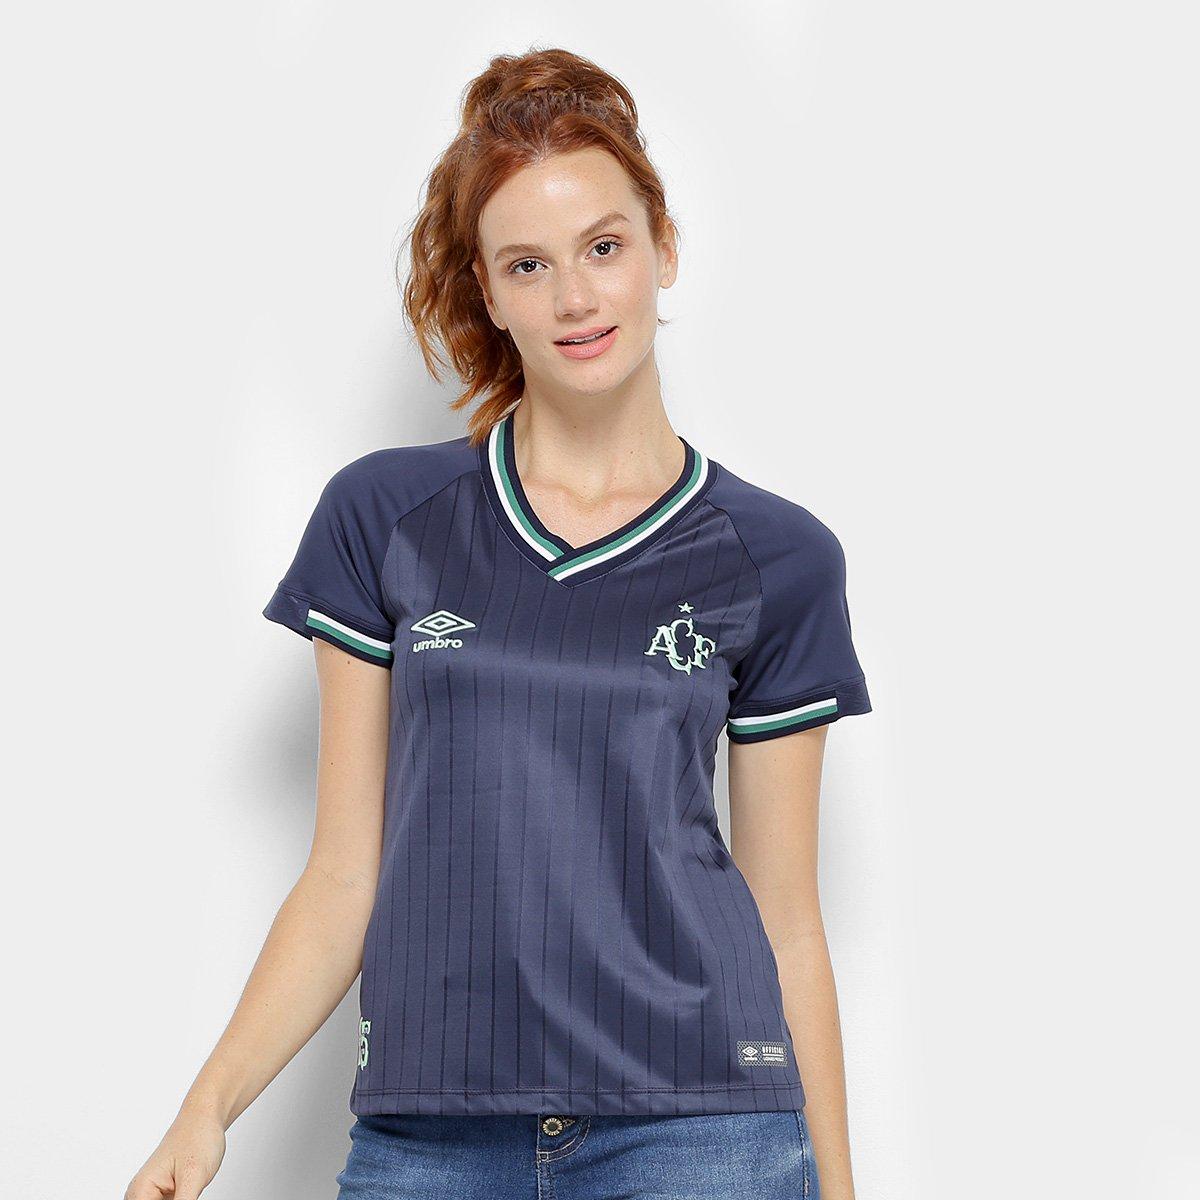 b2a96d1d0832f Camisa Chapecoense III 2018 s/n° Torcedor Umbro Feminina - Marinho e Verde  | Loja da Chape